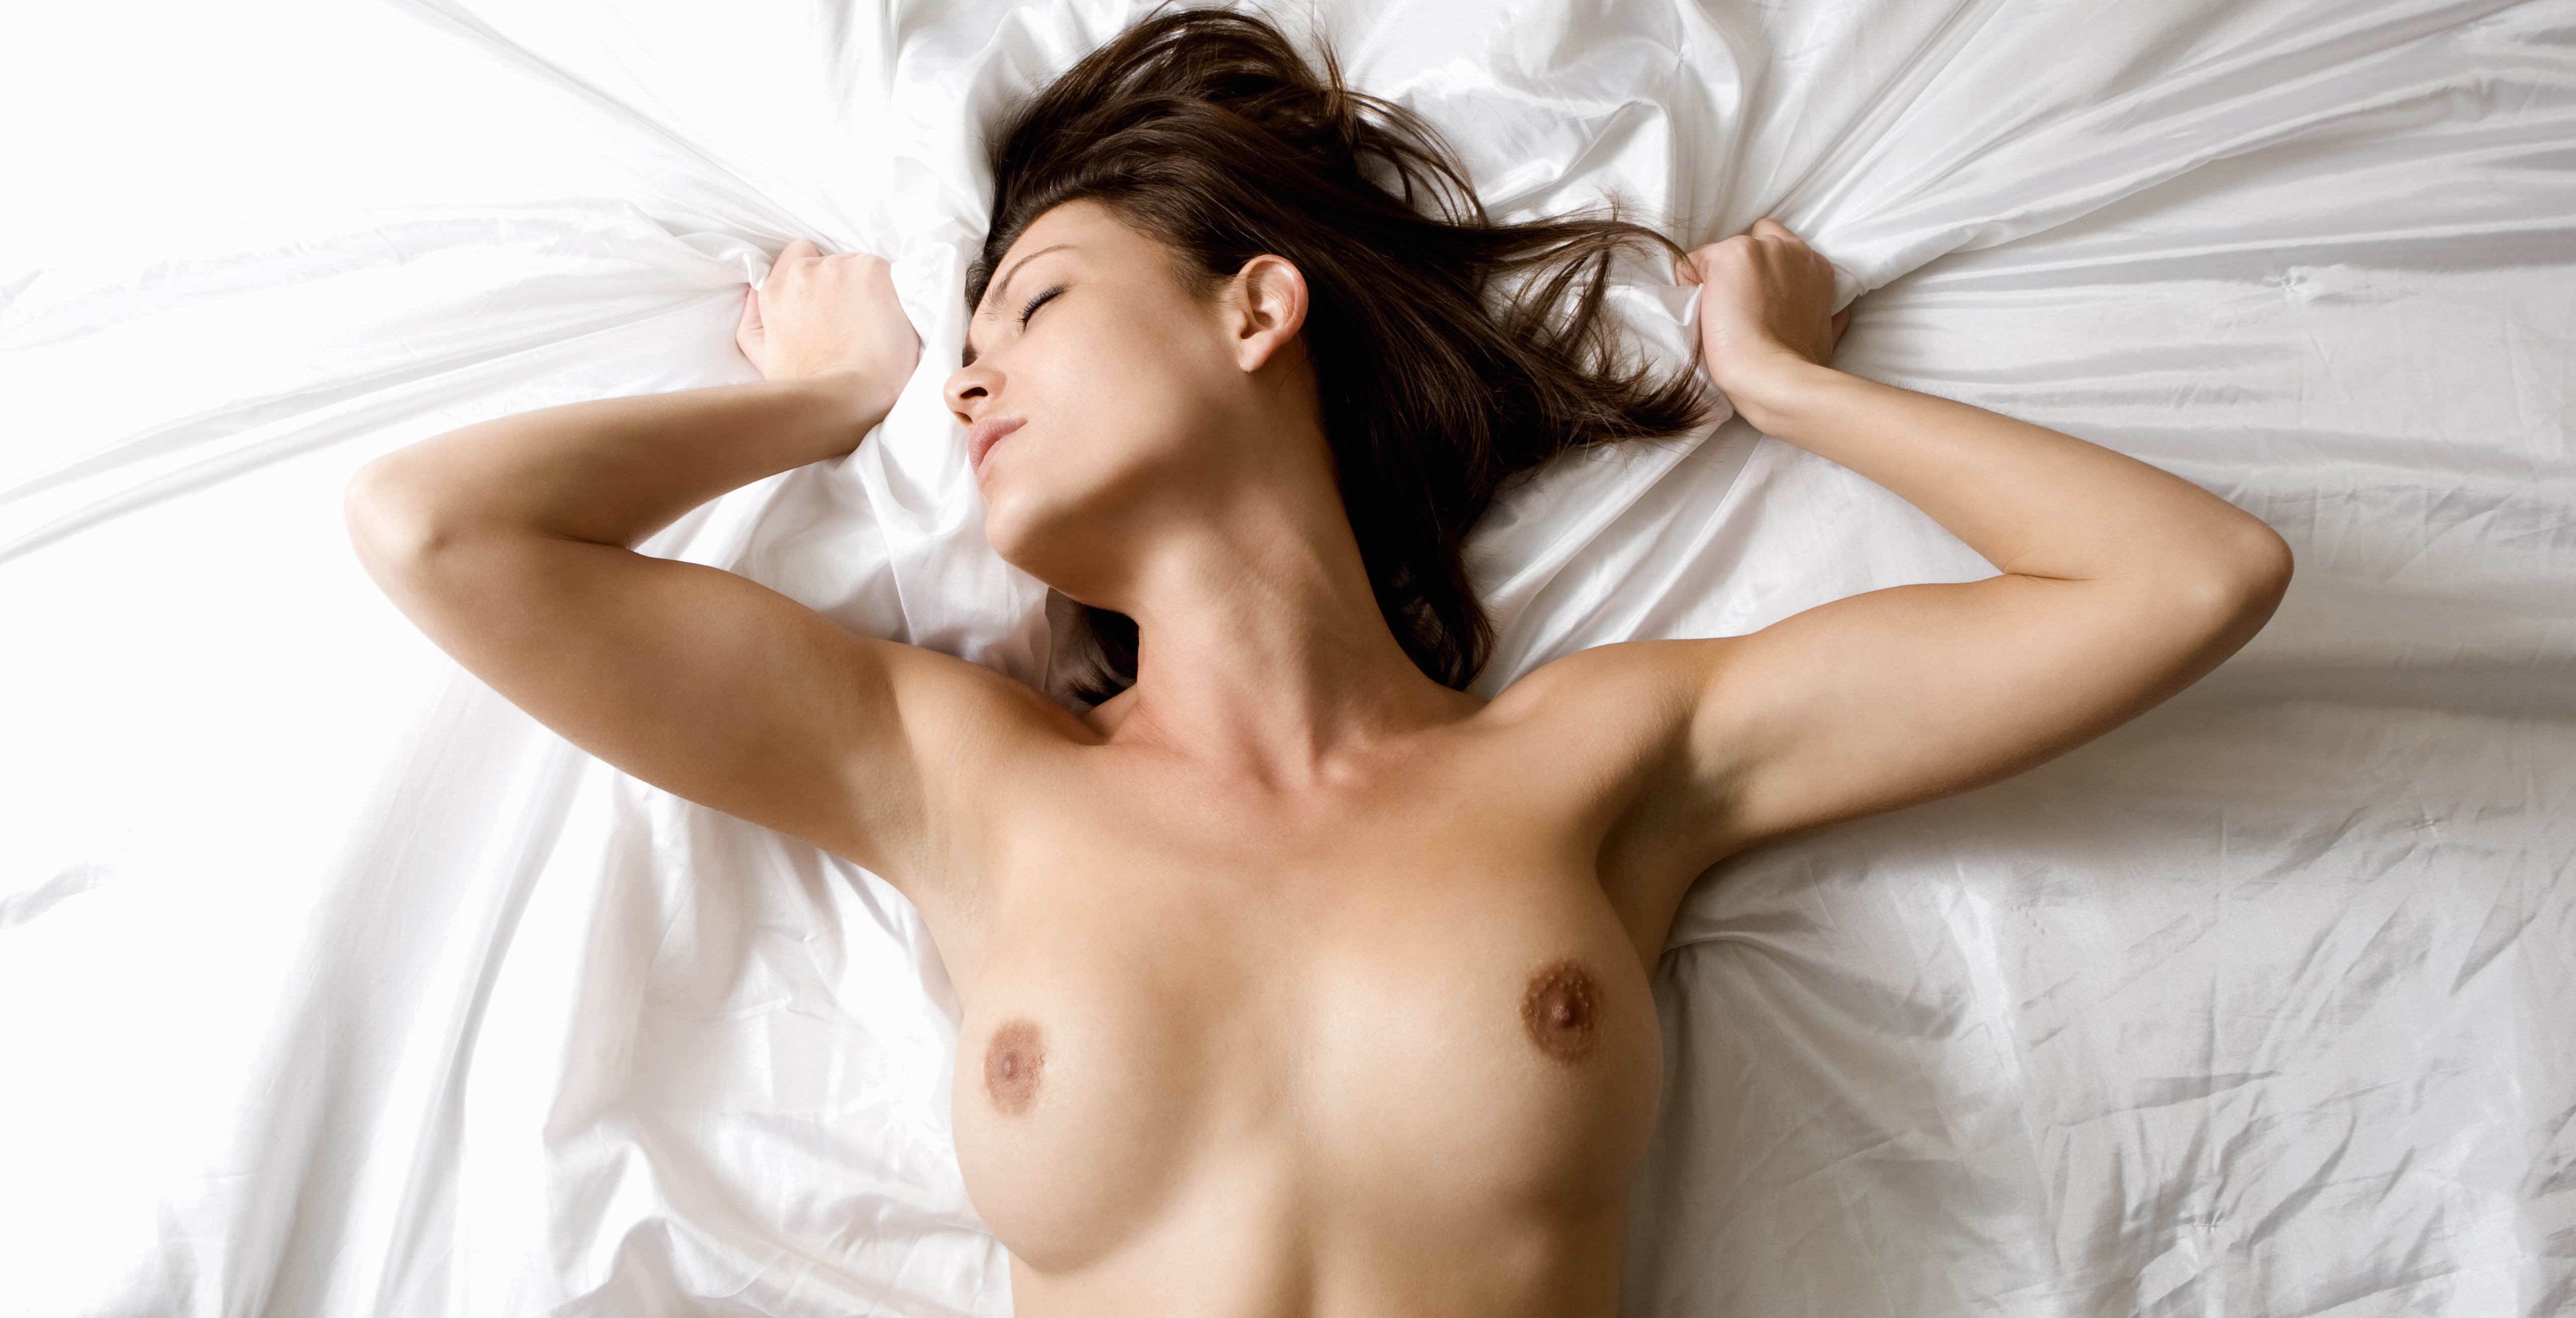 Sexy naakt stelletjes vrijen